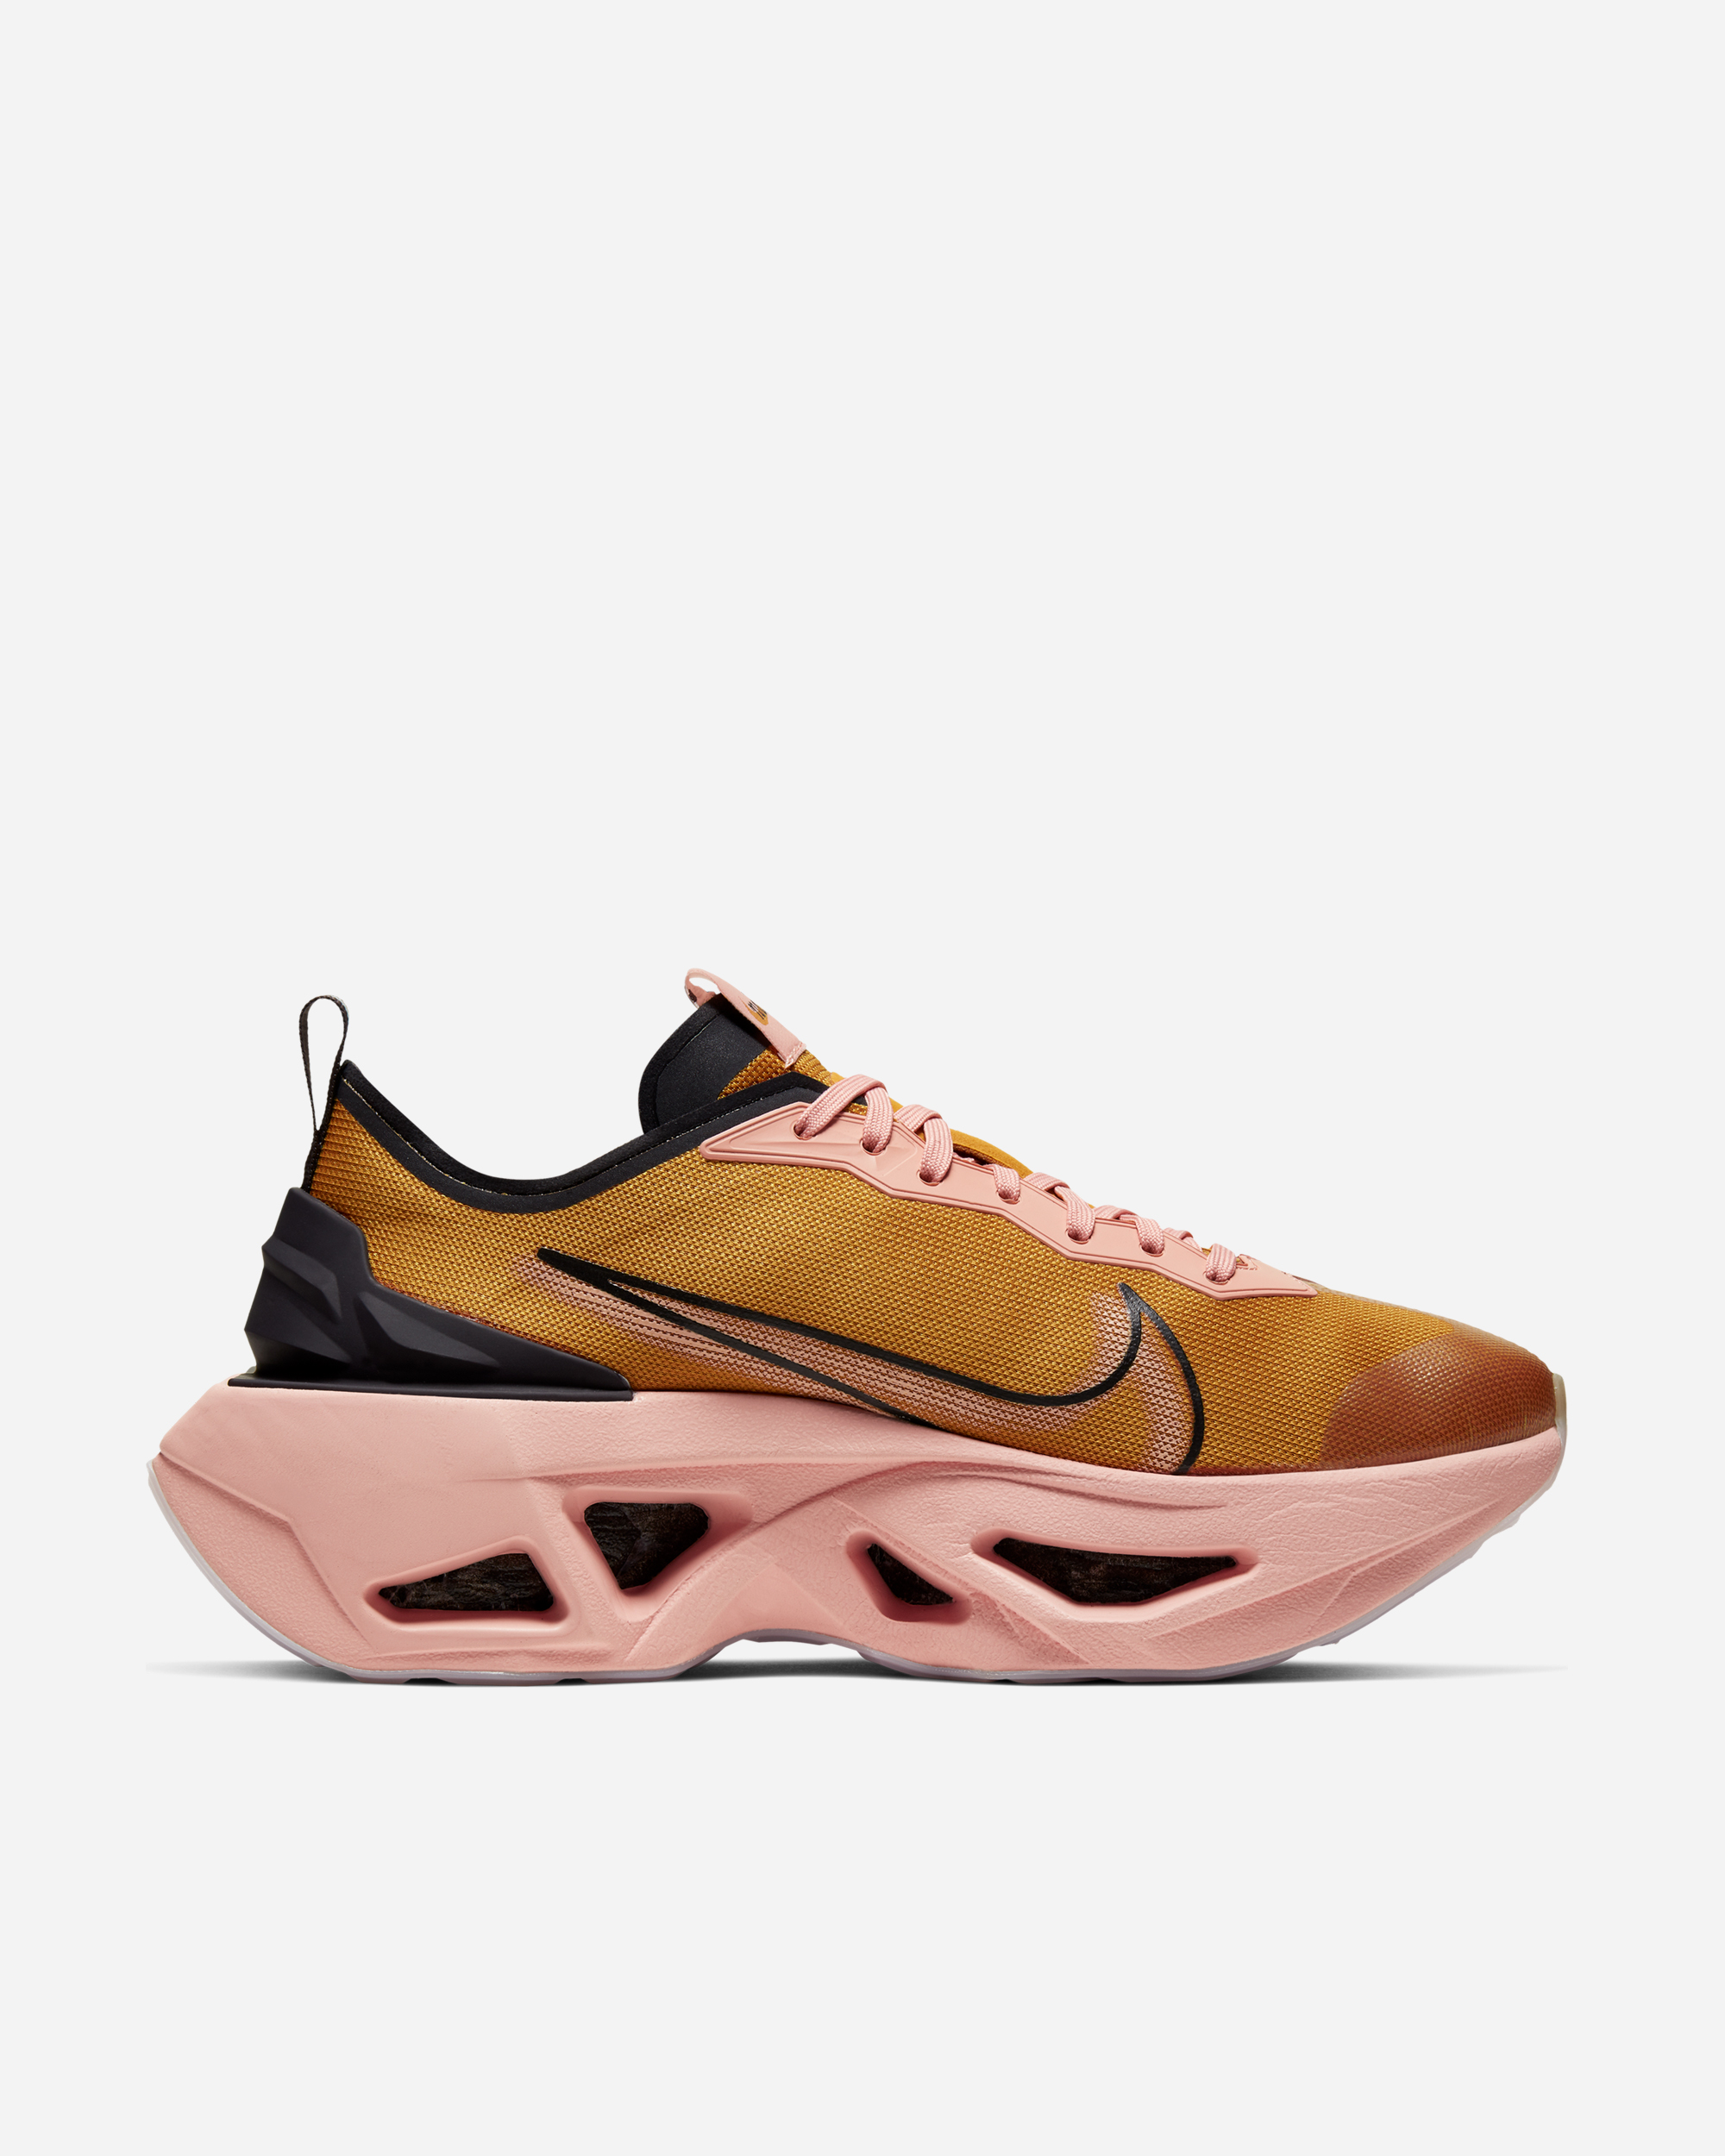 A escala nacional Indiferencia Con qué frecuencia  Nike Sportswear Zoom x Vista Grind Gold Suede/Oil Grey | BQ4800 701 – Naked